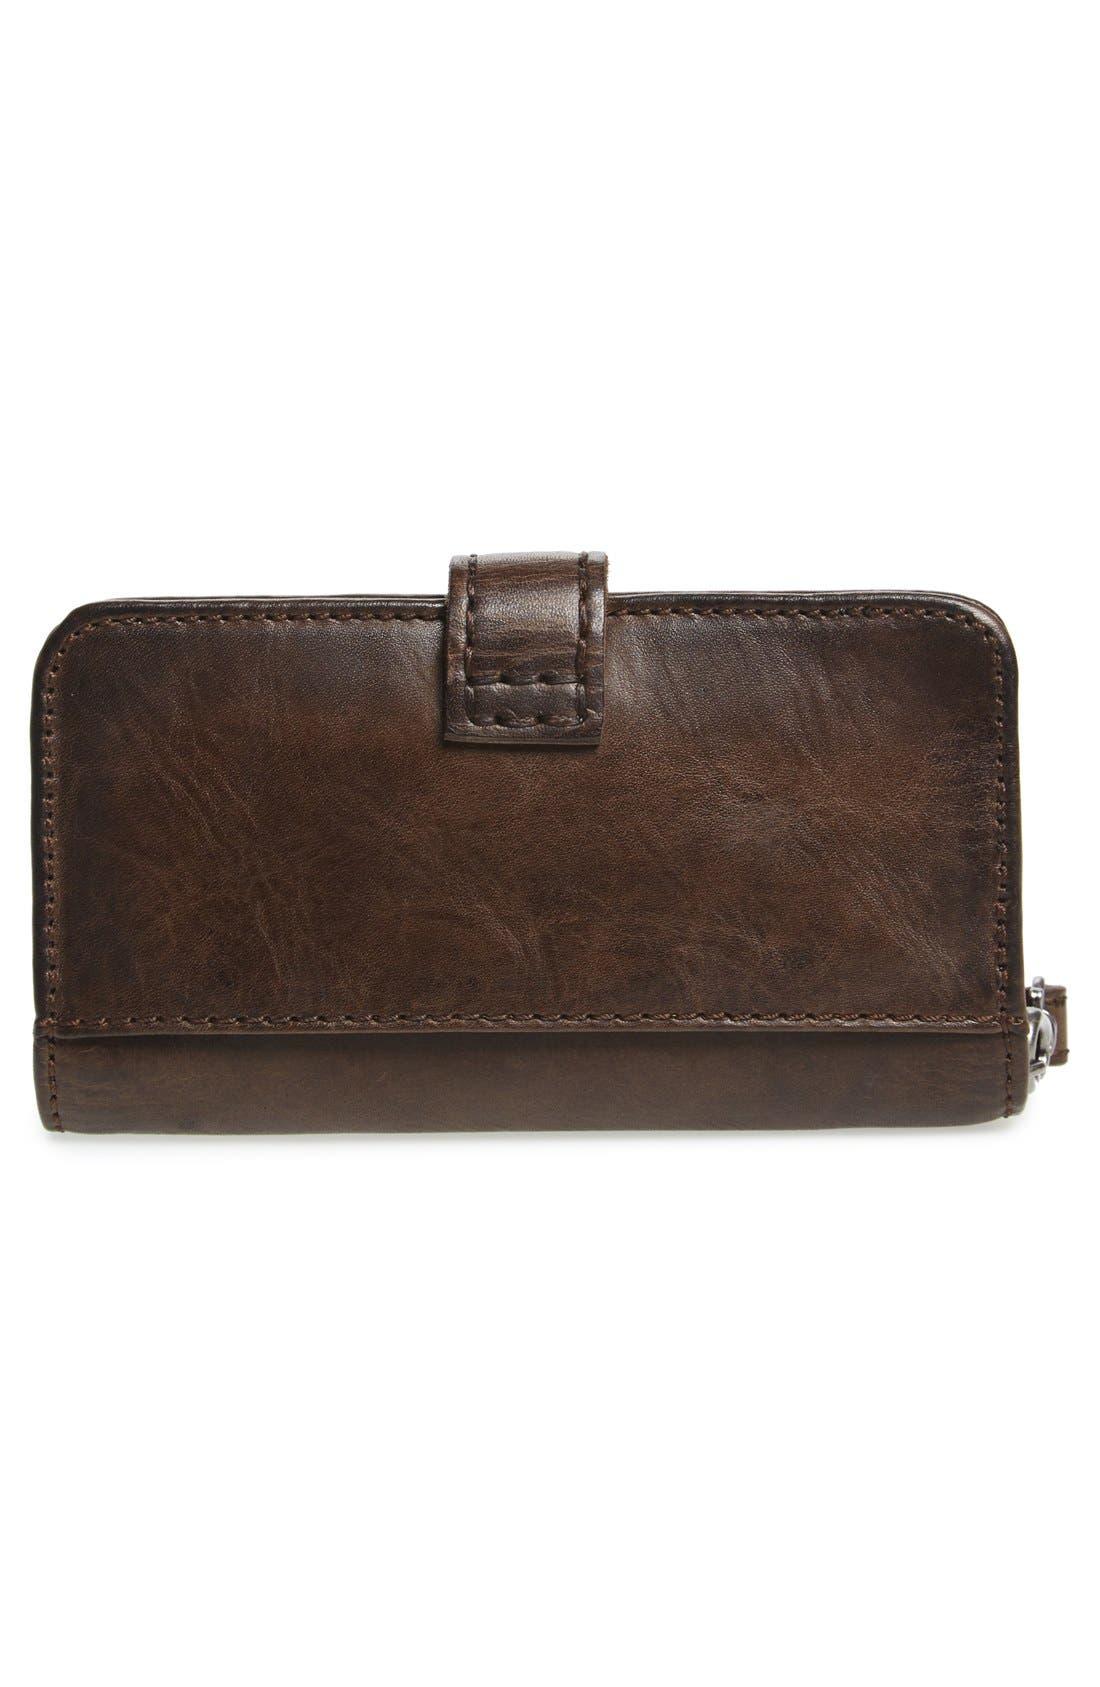 'Melissa' Leather Phone Wallet,                             Alternate thumbnail 2, color,                             020